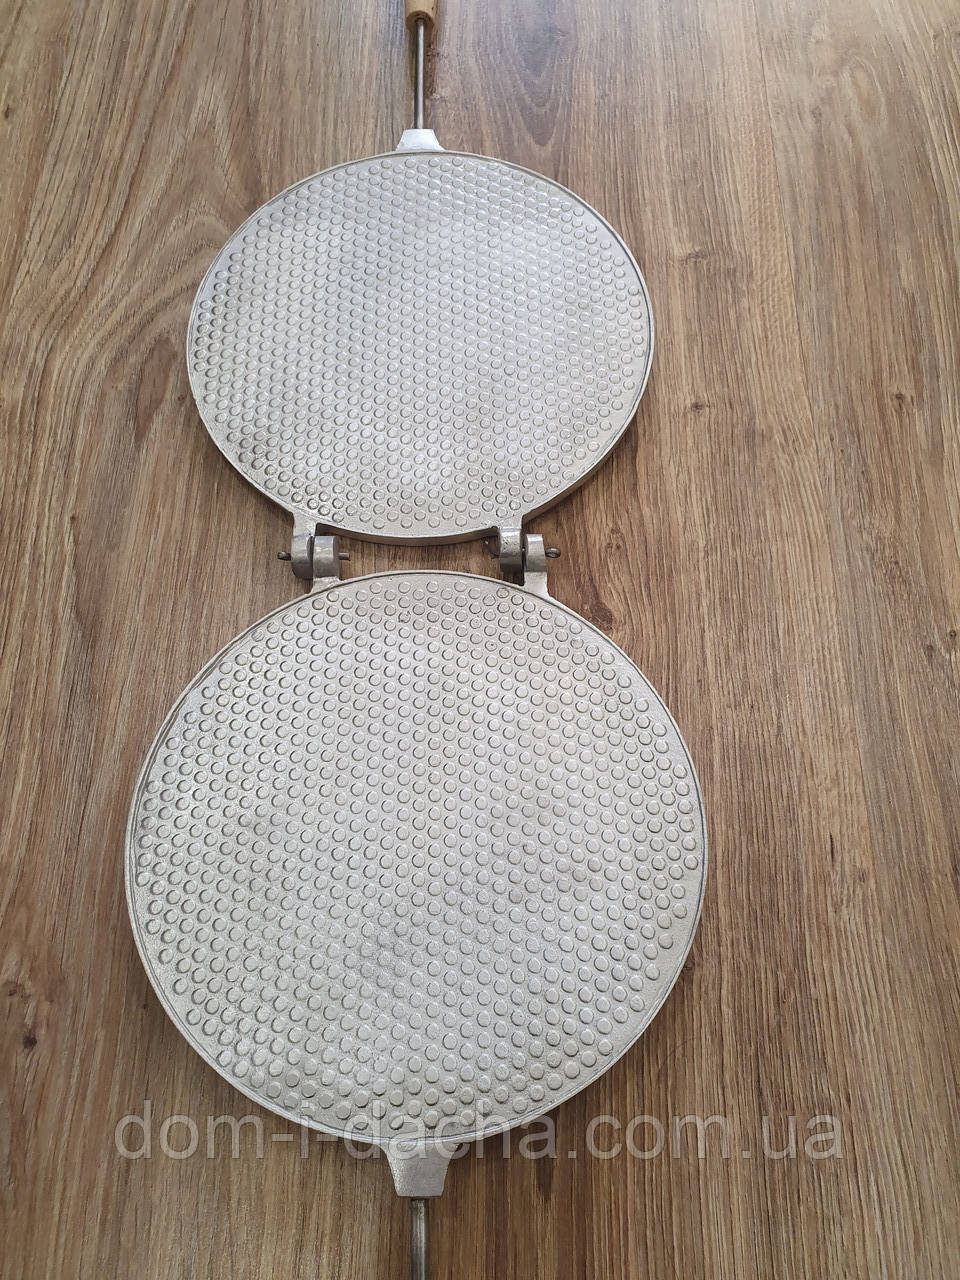 Вафельница круглая диаметр 21 см